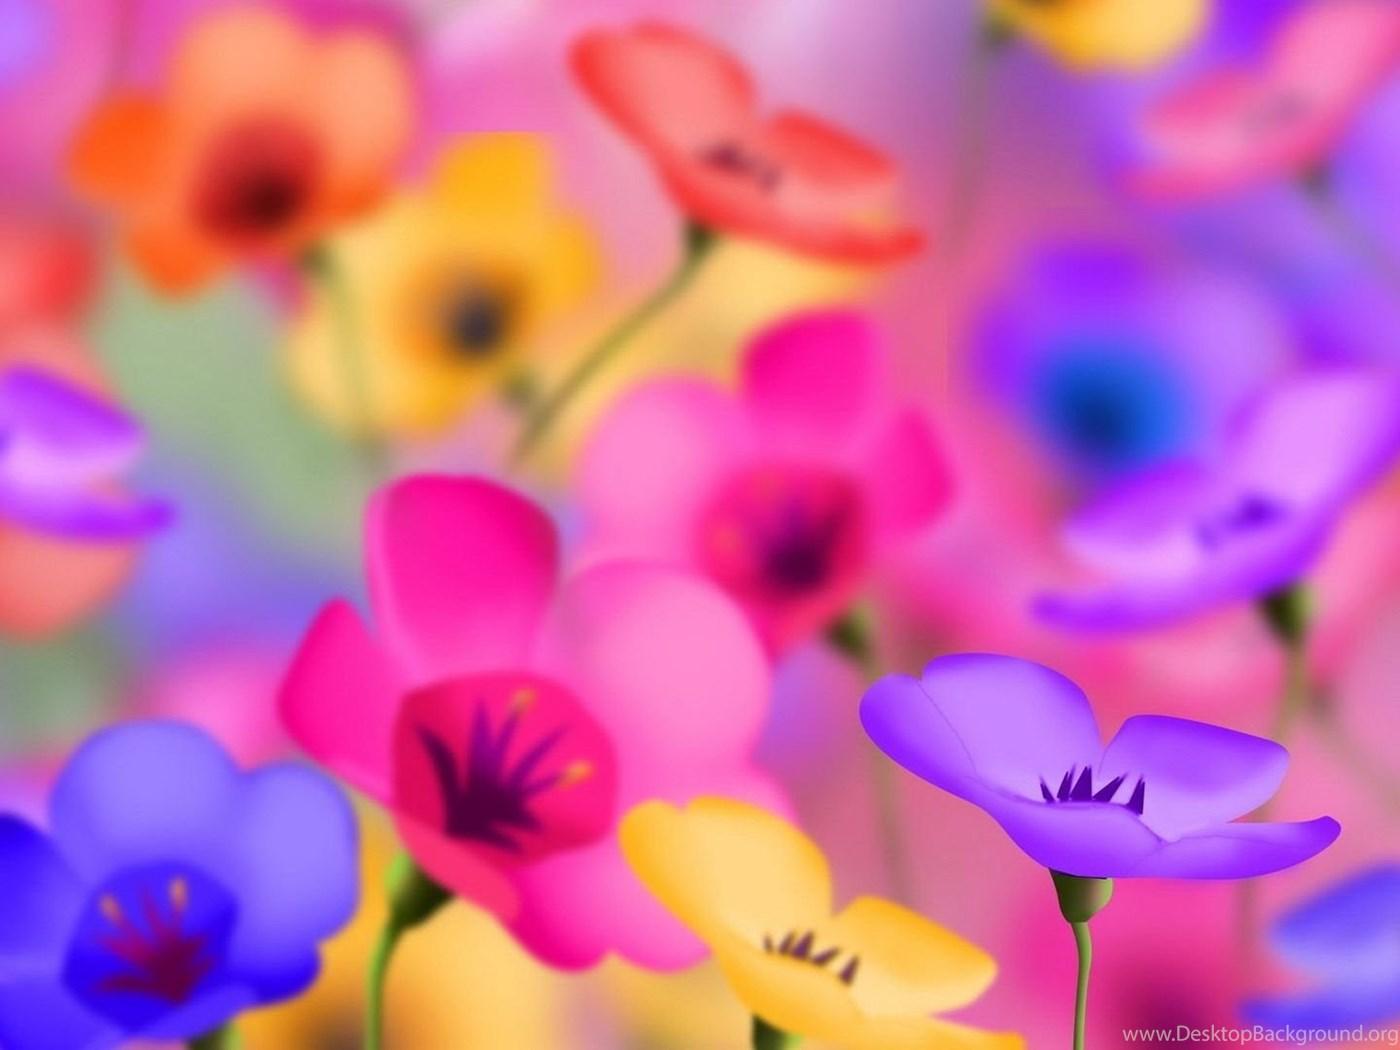 Full Hd 1080p Flowers Wallpapers Desktop Backgrounds Hd Downloads